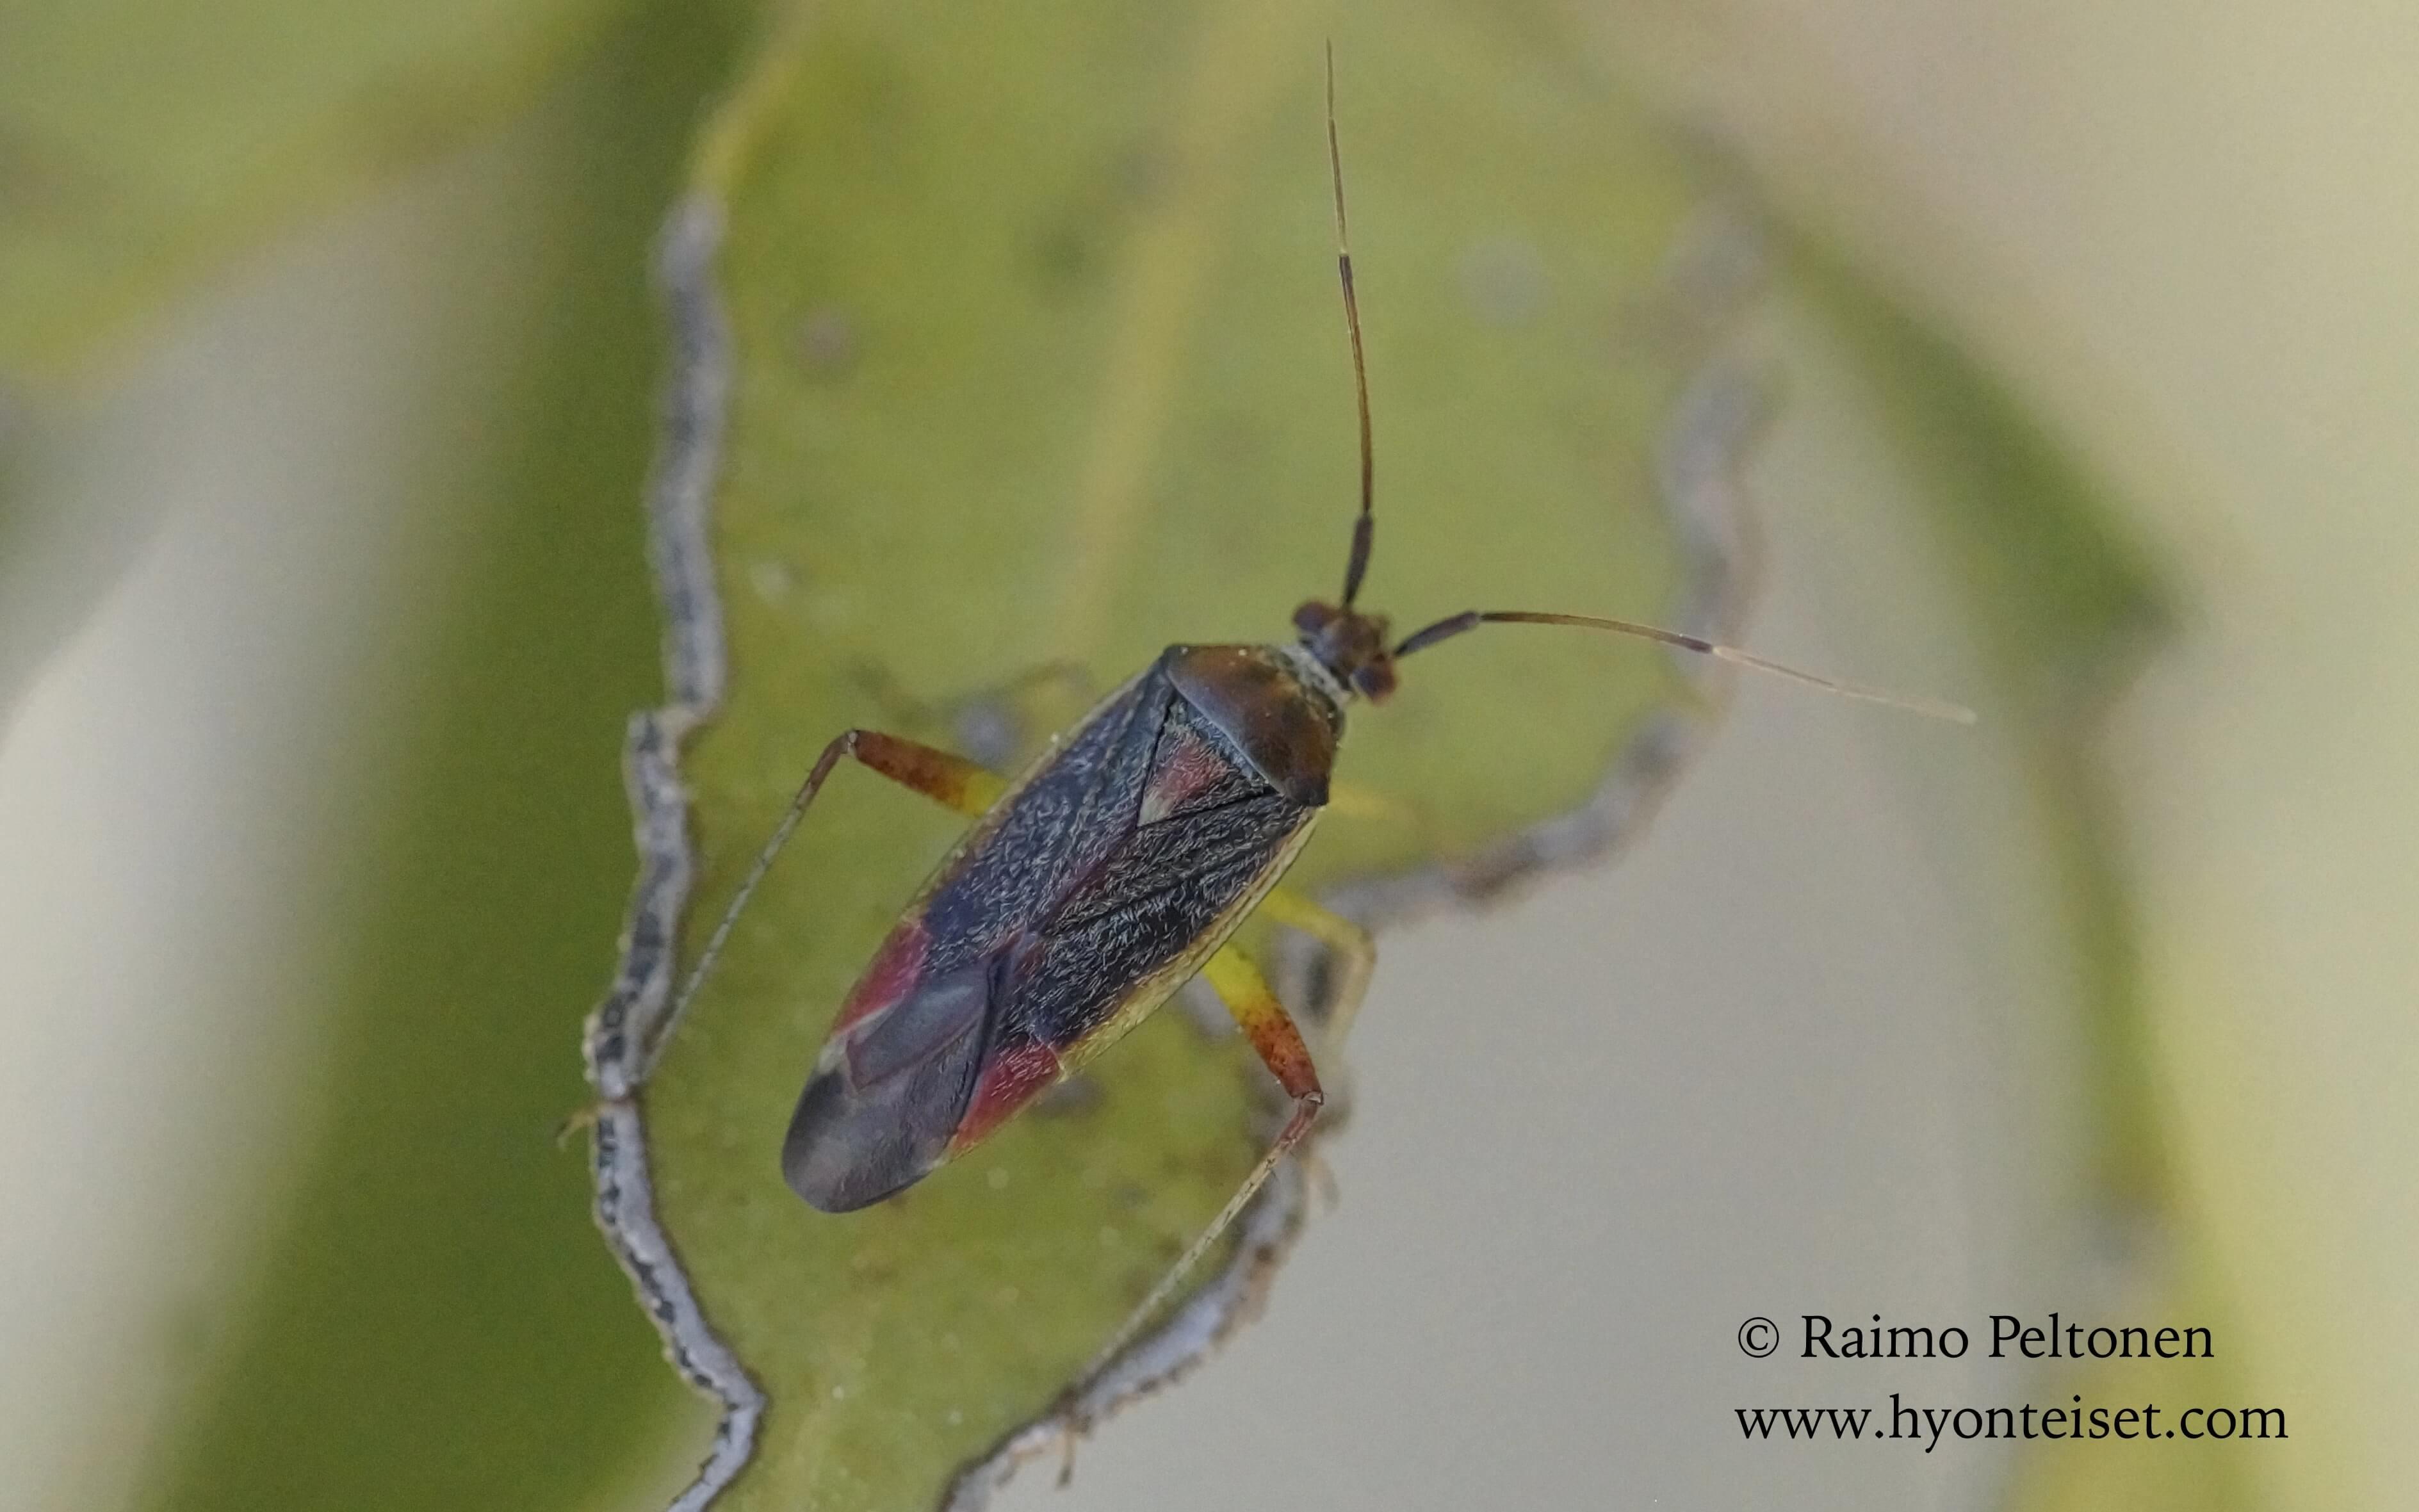 Closterotomus trivialis, koiras (Miridae) MALLORCA